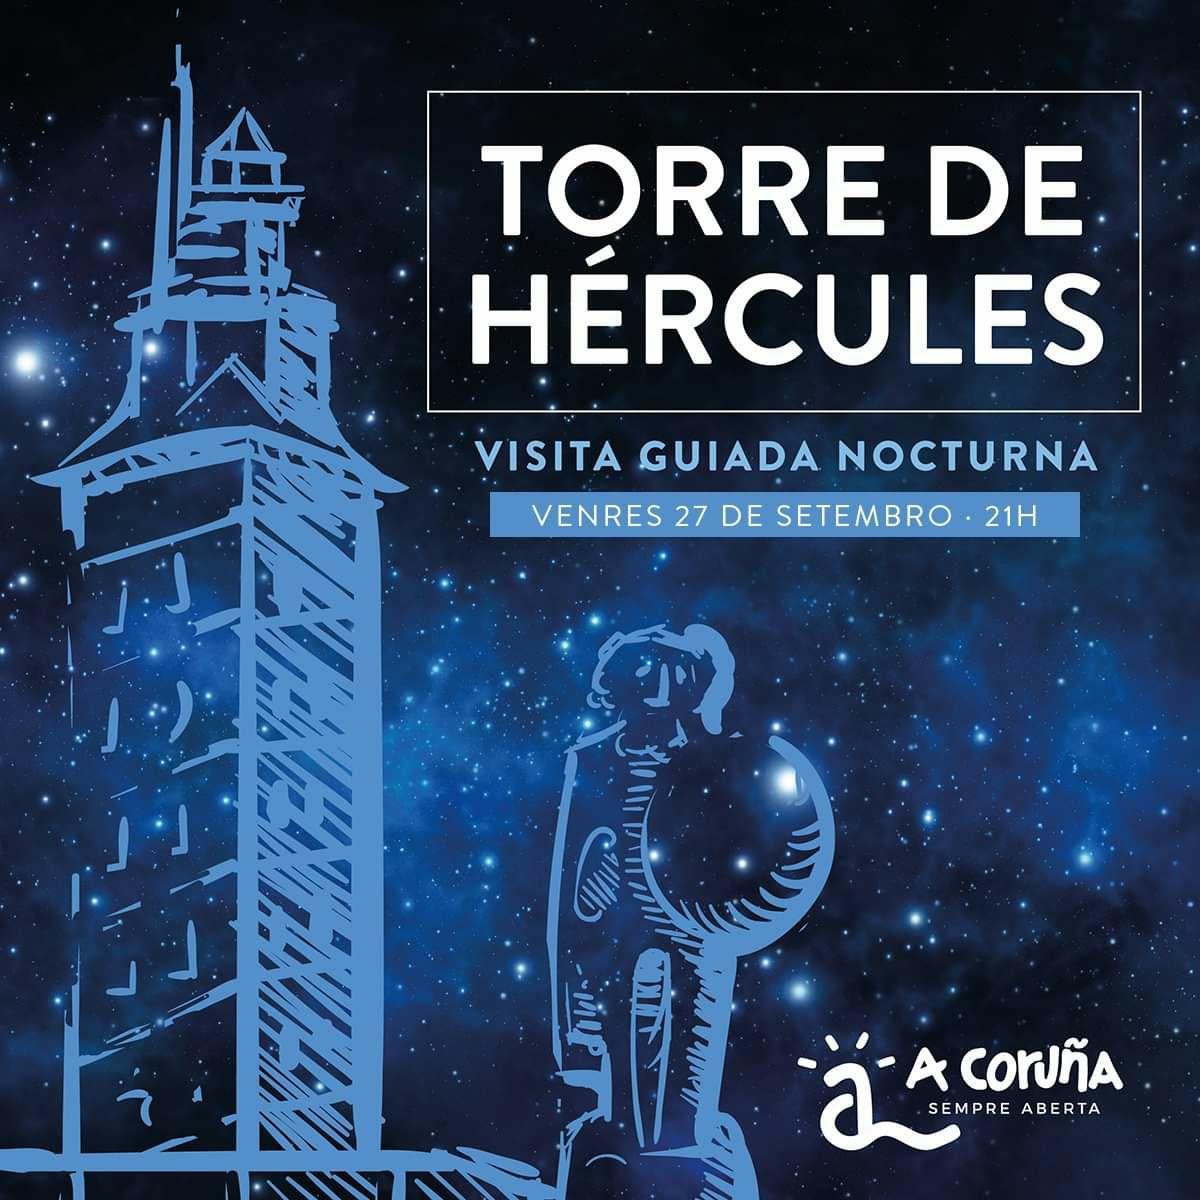 Visita guiada nocturna 27 de septiembre a la Torre de Hércules